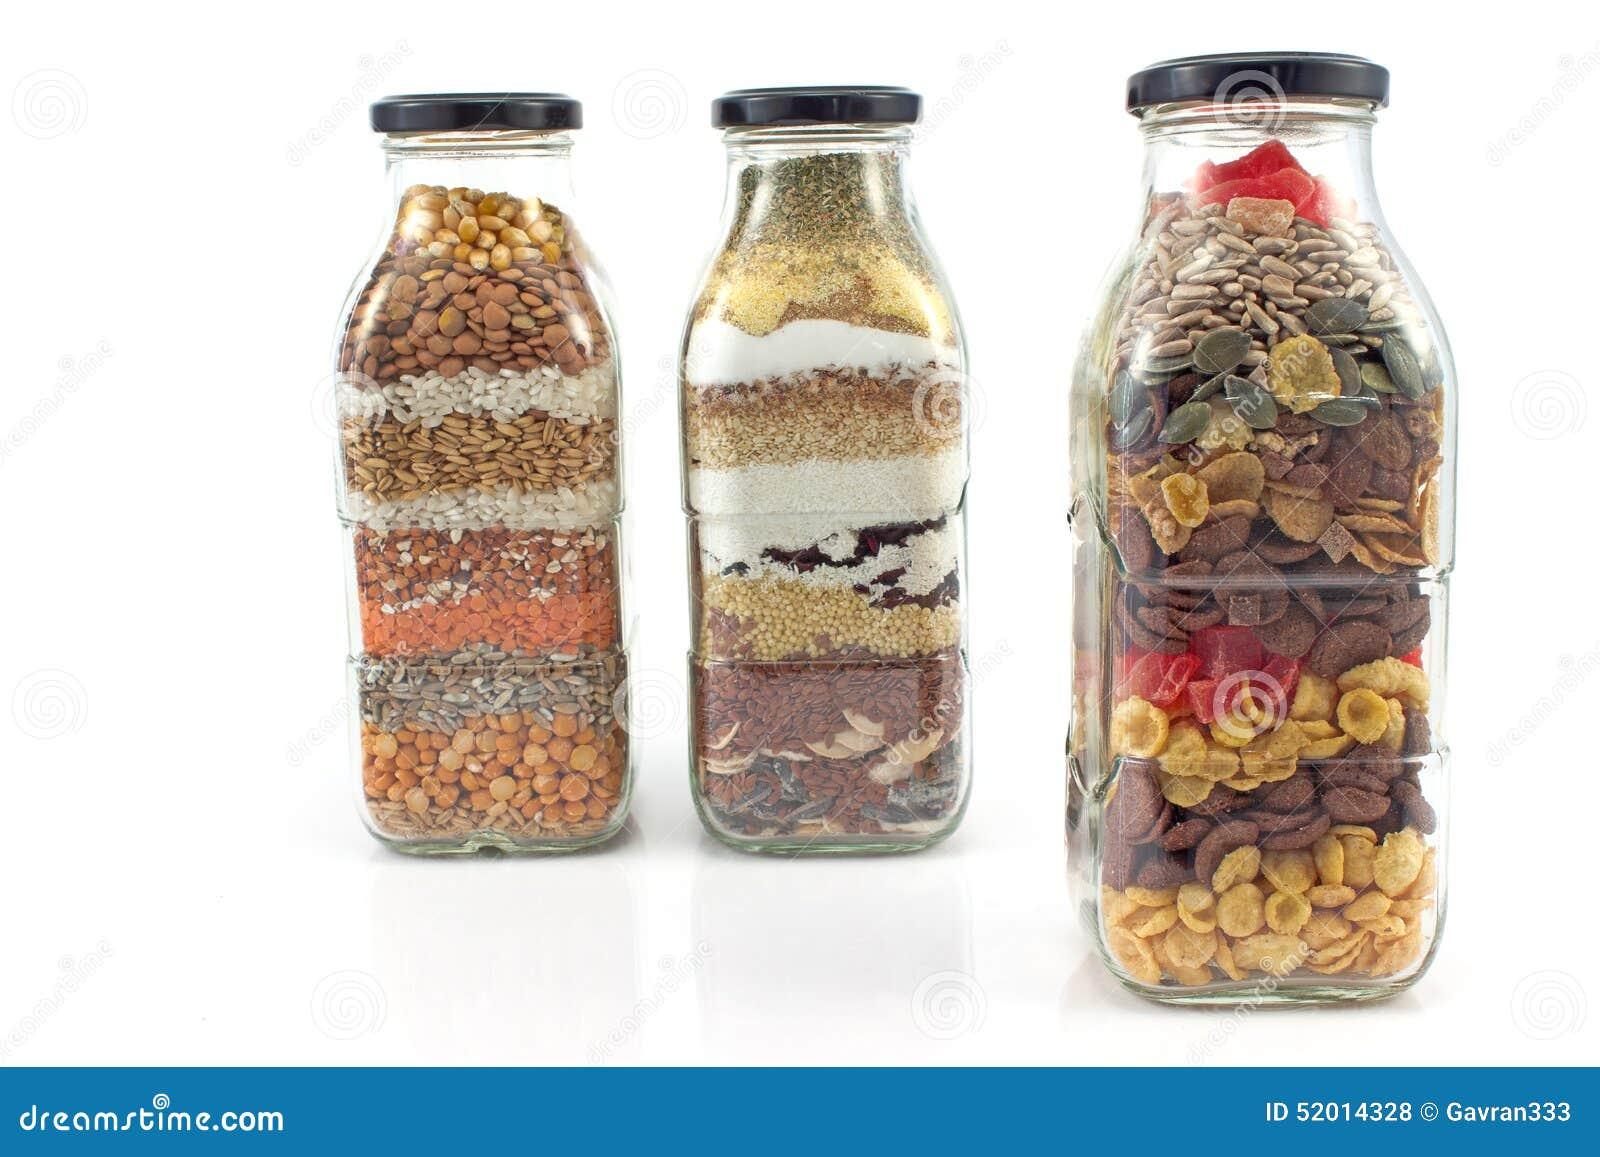 Ornamental bottles - Bottles Decorative